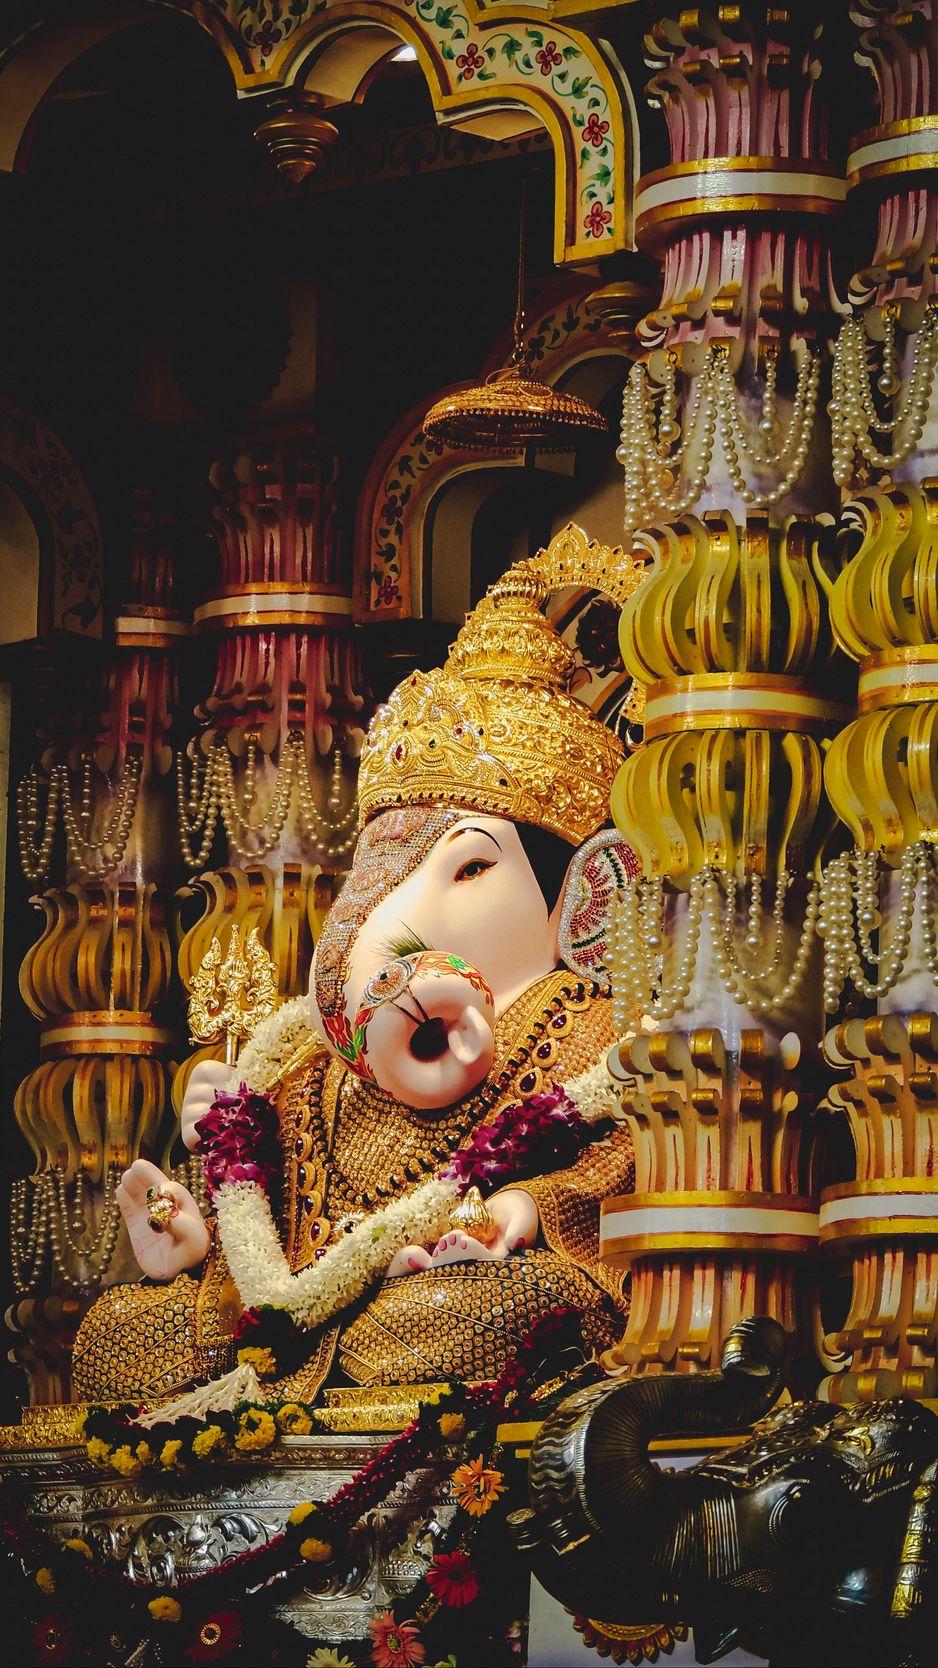 938x1668 Wallpaper ganesha, deity, god, religion, statuette, columns, golden